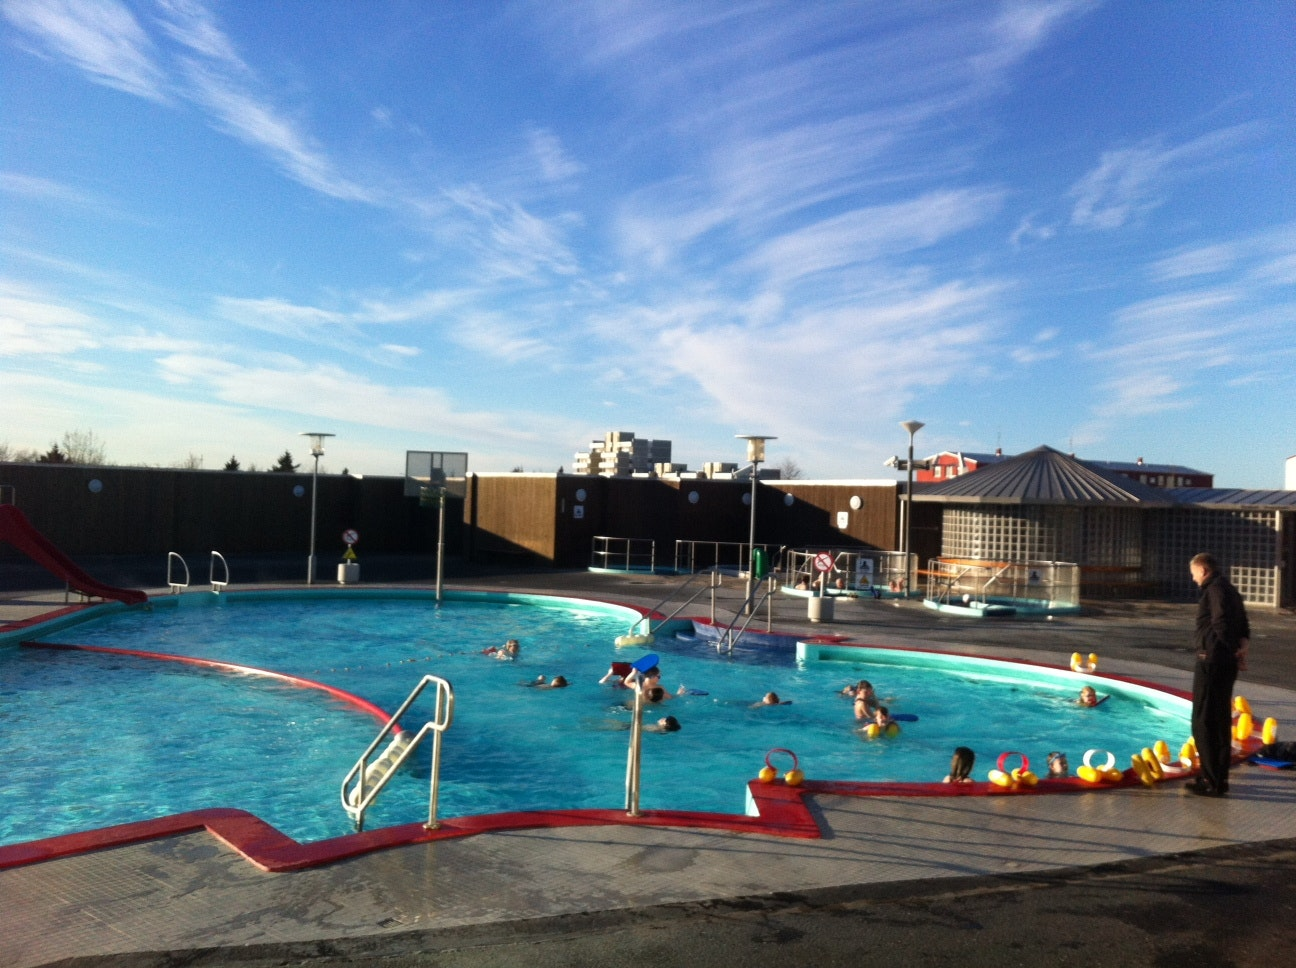 vesturbaejarlaug-冰岛首都雷克雅未克温泉泳池